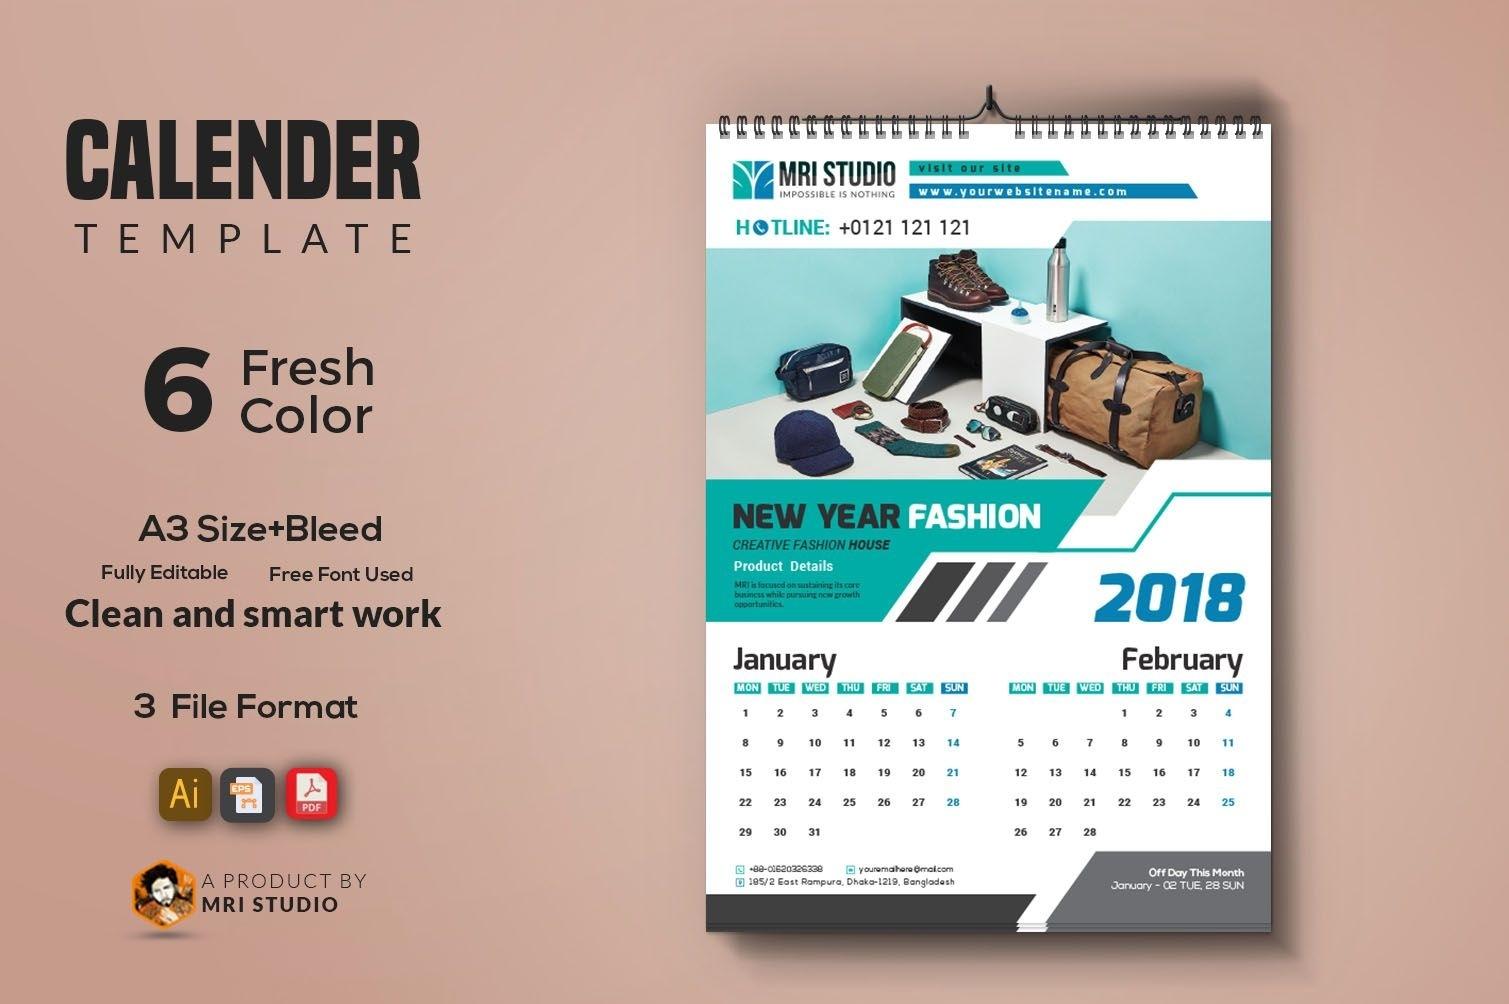 Calender Template 2018 | Calender Template, School Calendar Calendar Template Graphic Design